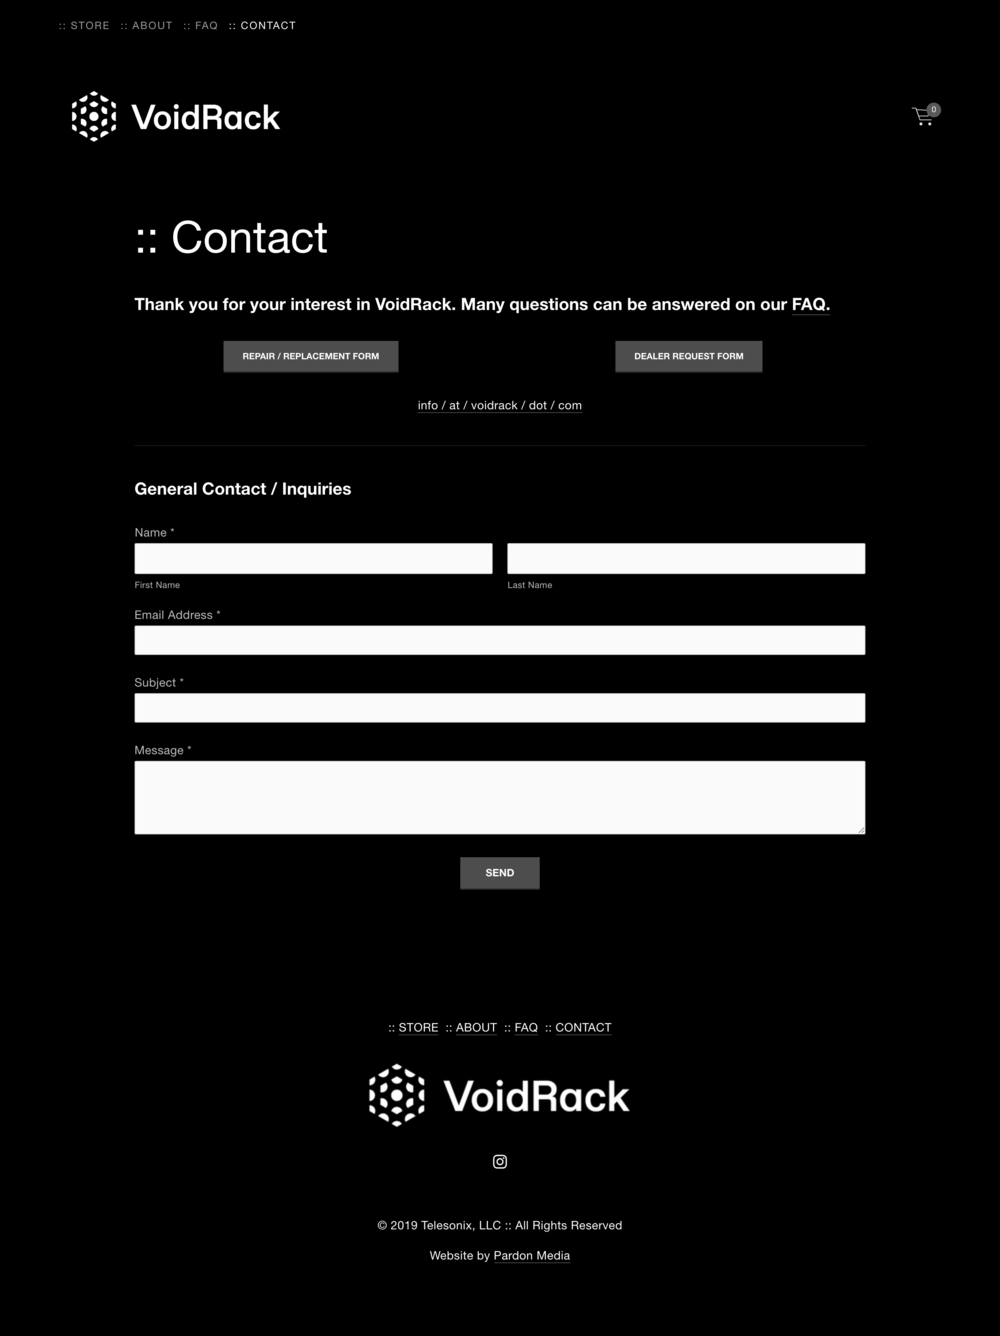 screencapture-voidrack-contact-2018-12-23-21_13_14.png